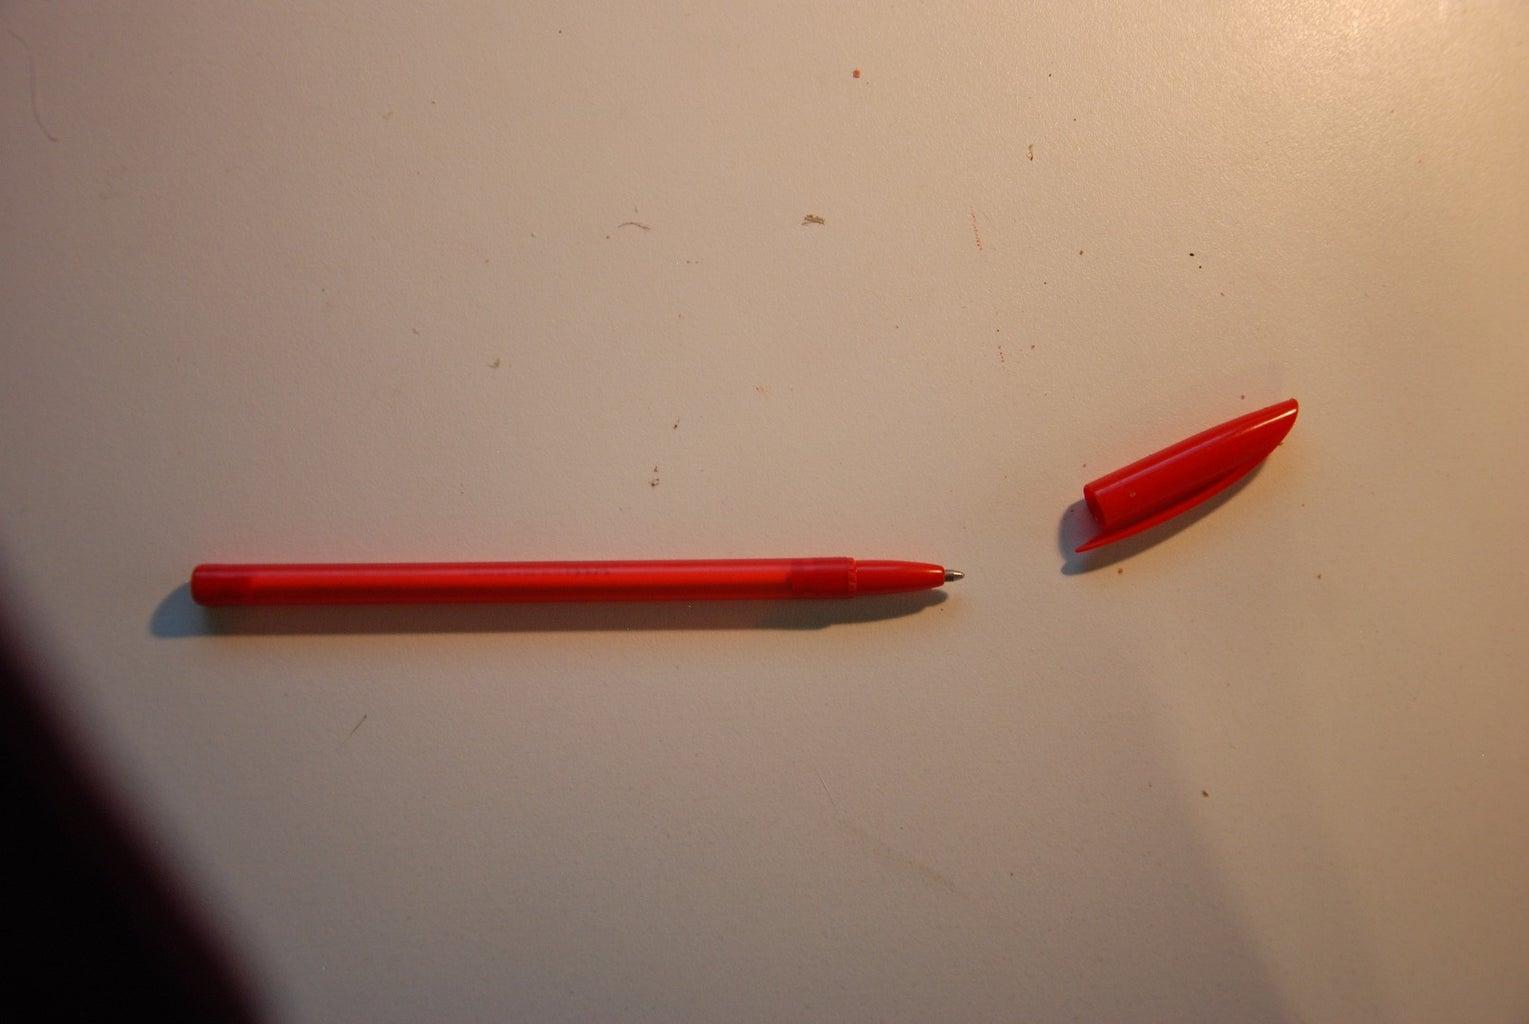 Disassemble Your Pen